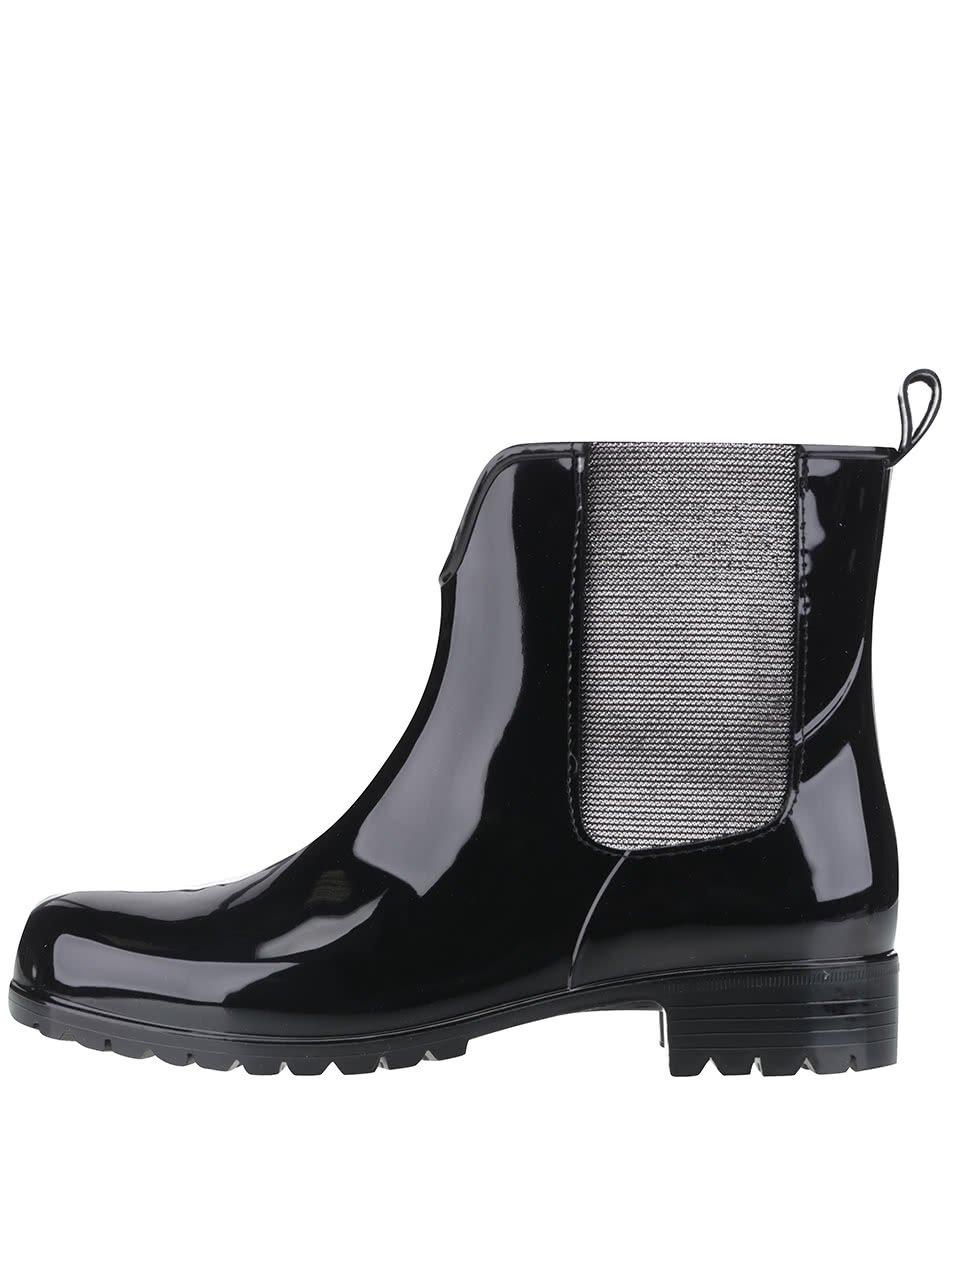 Černé gumové chelsea boty Tamaris